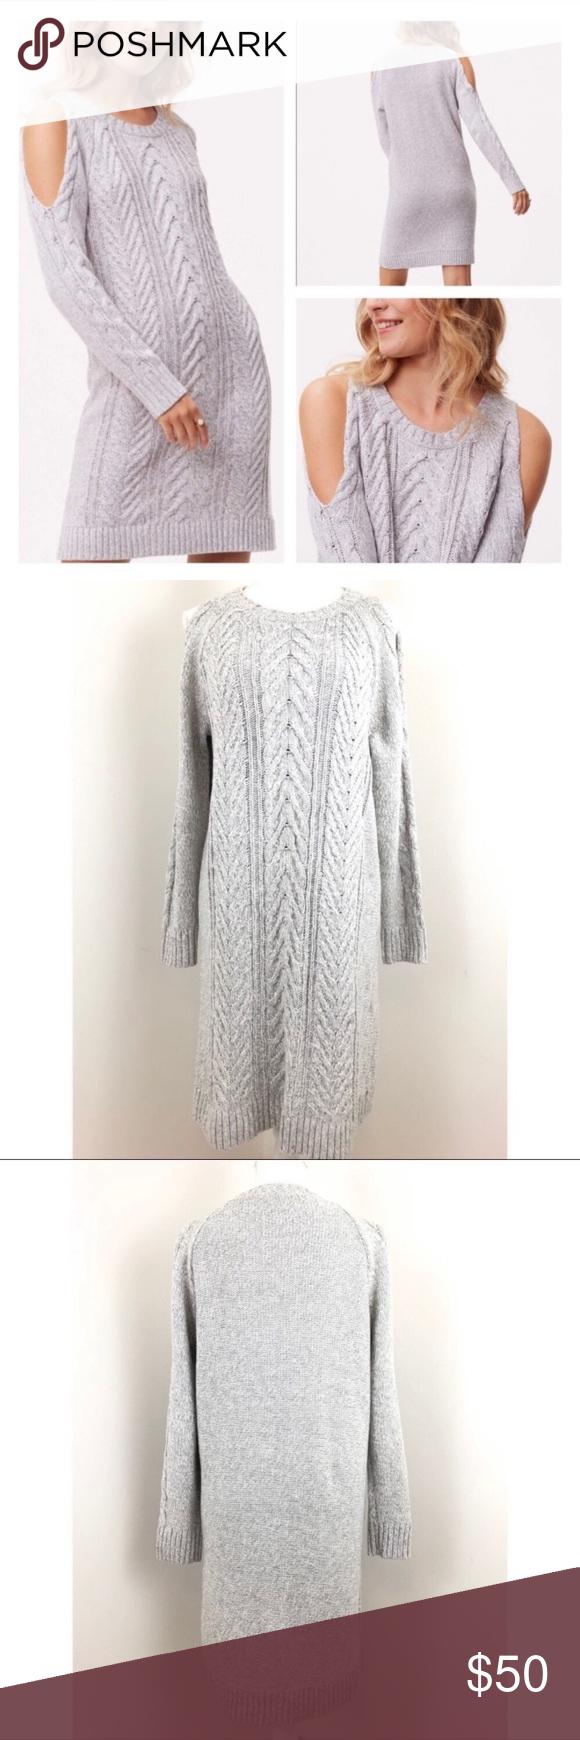 Loft Cable Cold Shoulder Sweater Dress G158 Cold Shoulder Sweater Dress Sweater Dress Long Sweater Dress